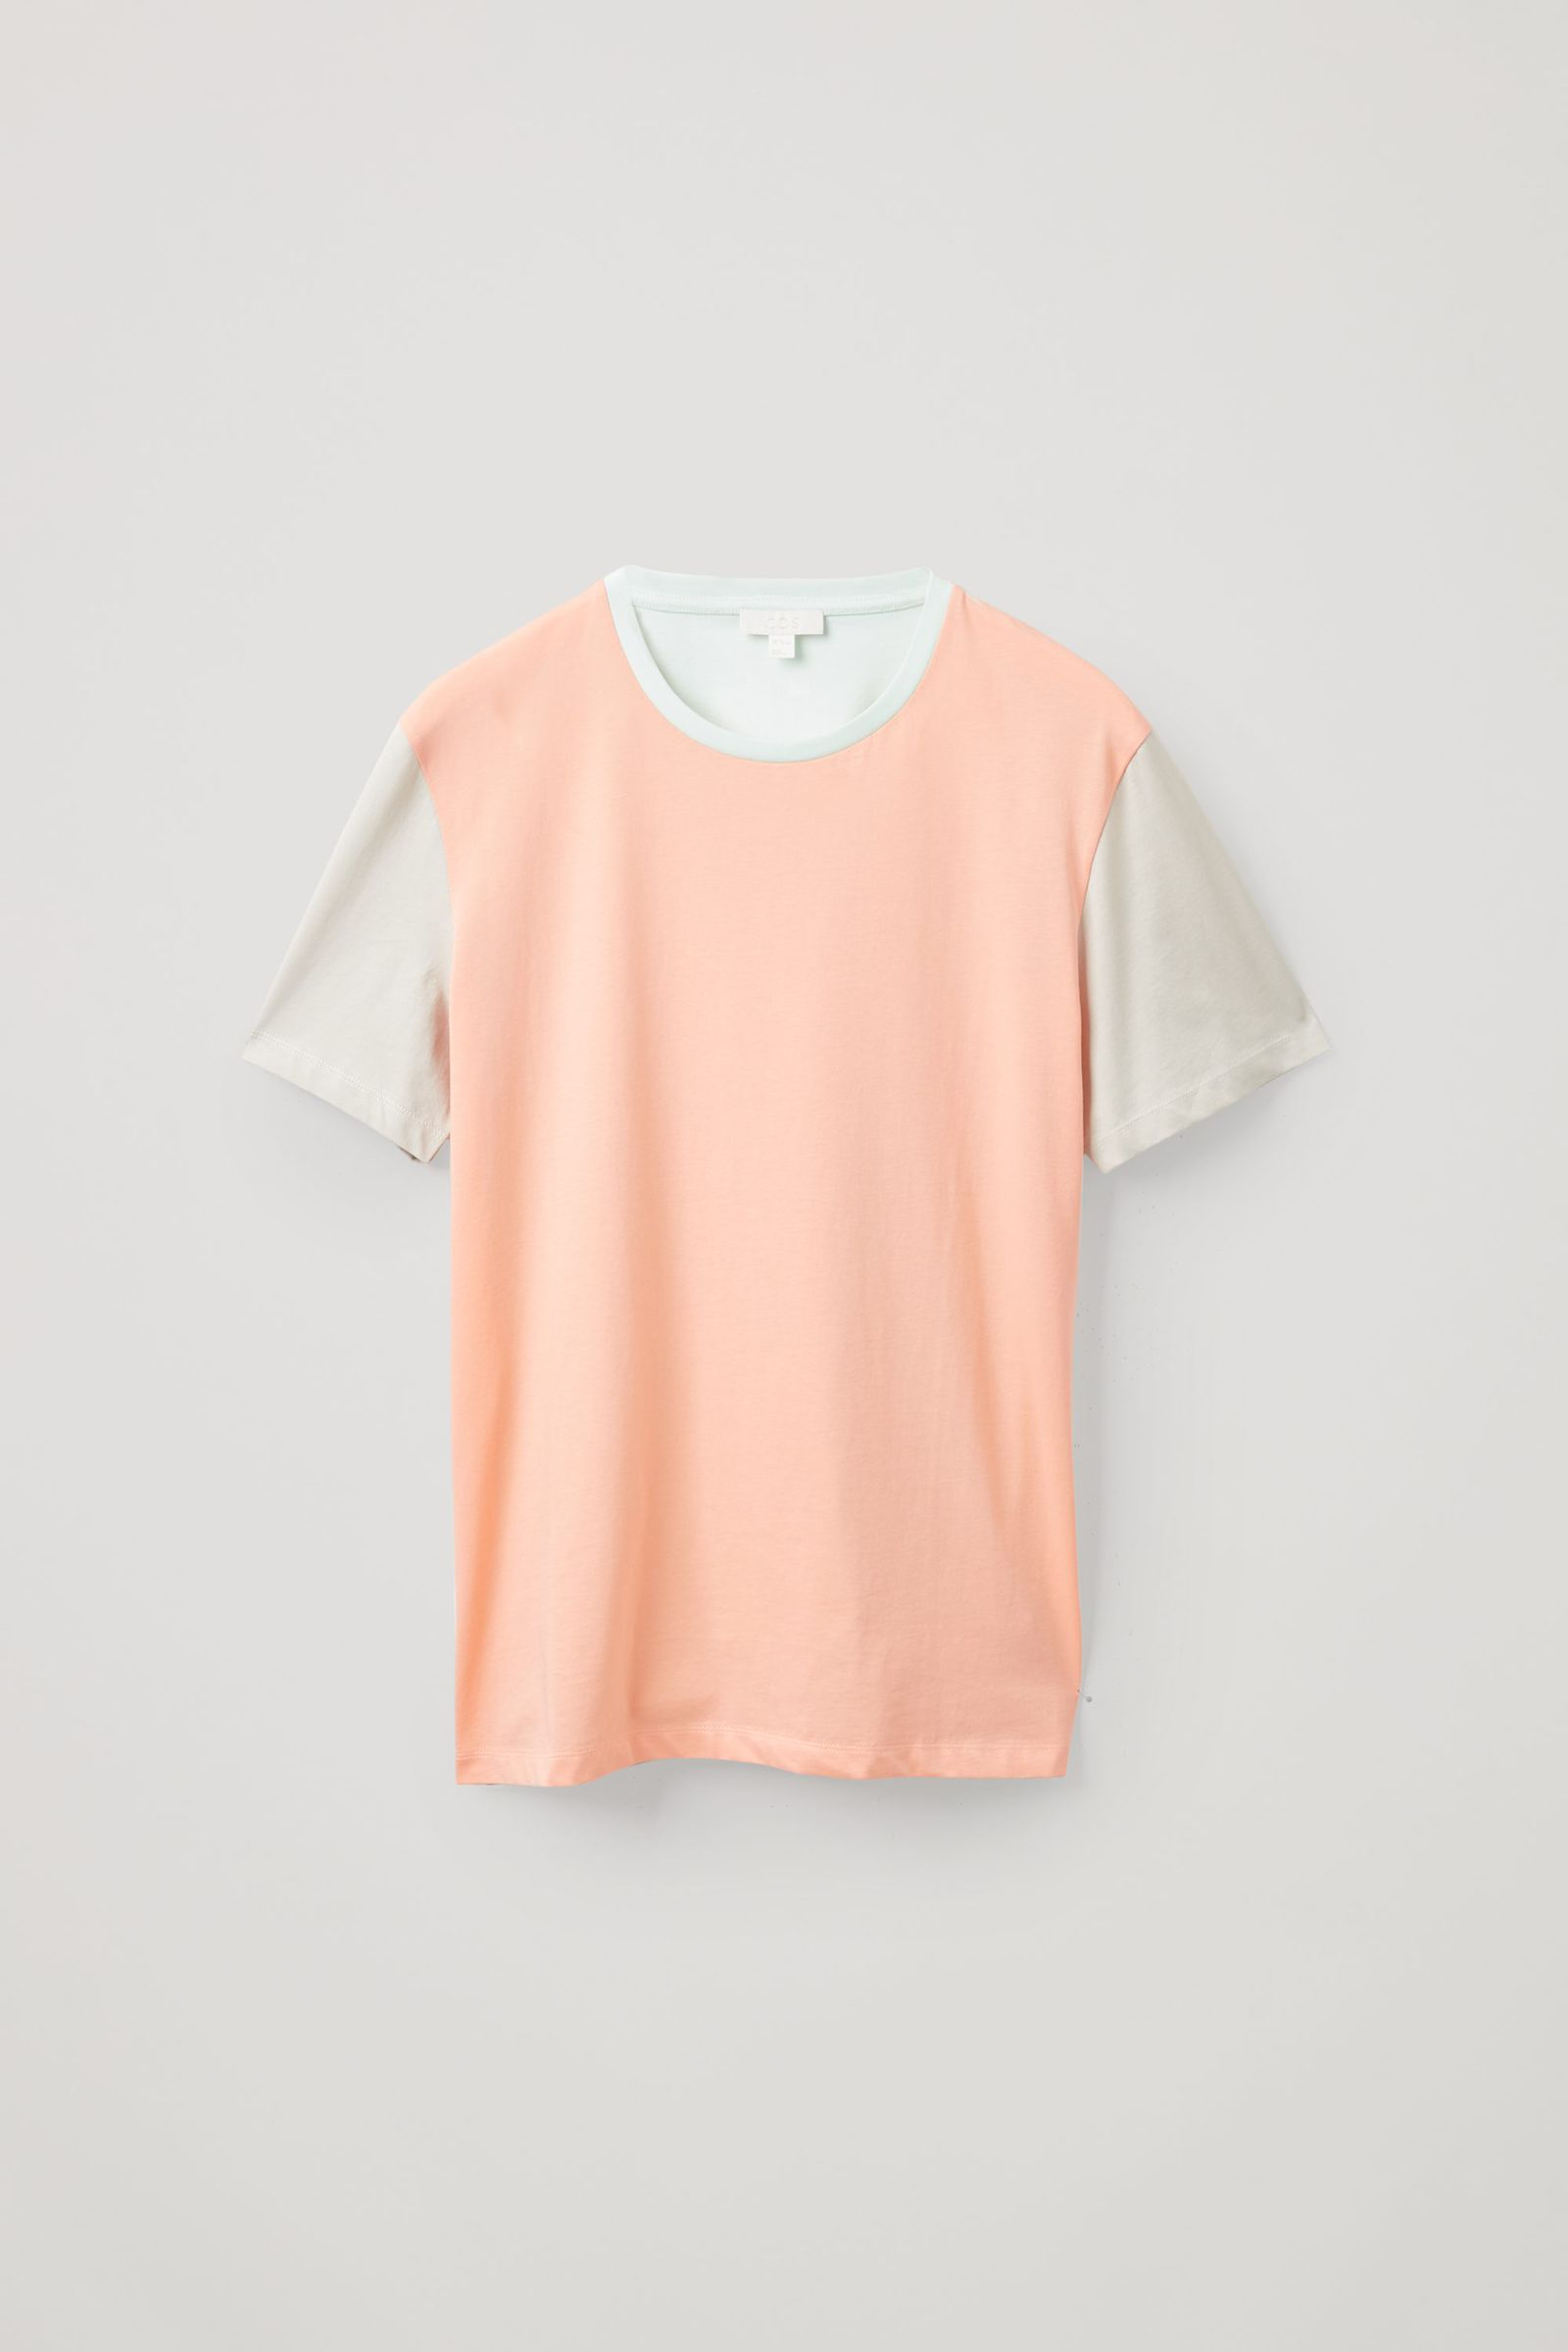 COS 라운드 넥 티셔츠의 살몬 / 베이지컬러 Product입니다.